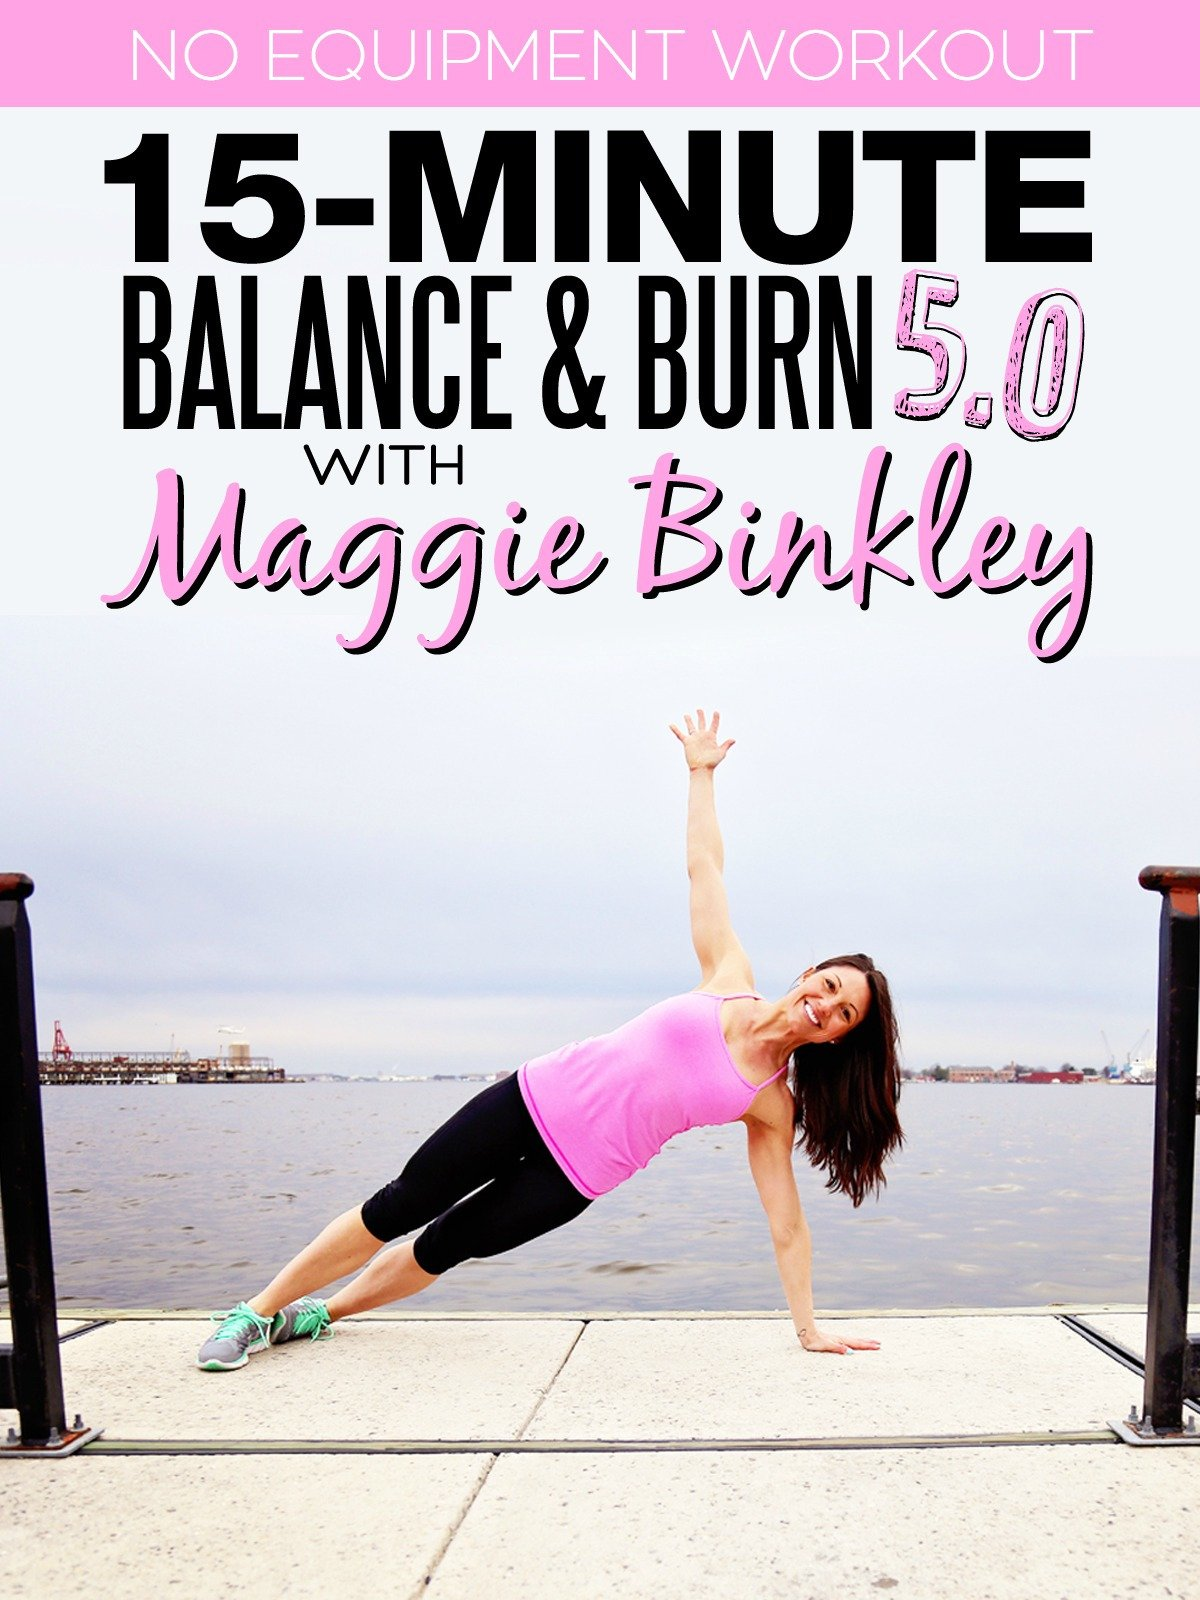 15-Minute Balance & Burn 5.0 Workout